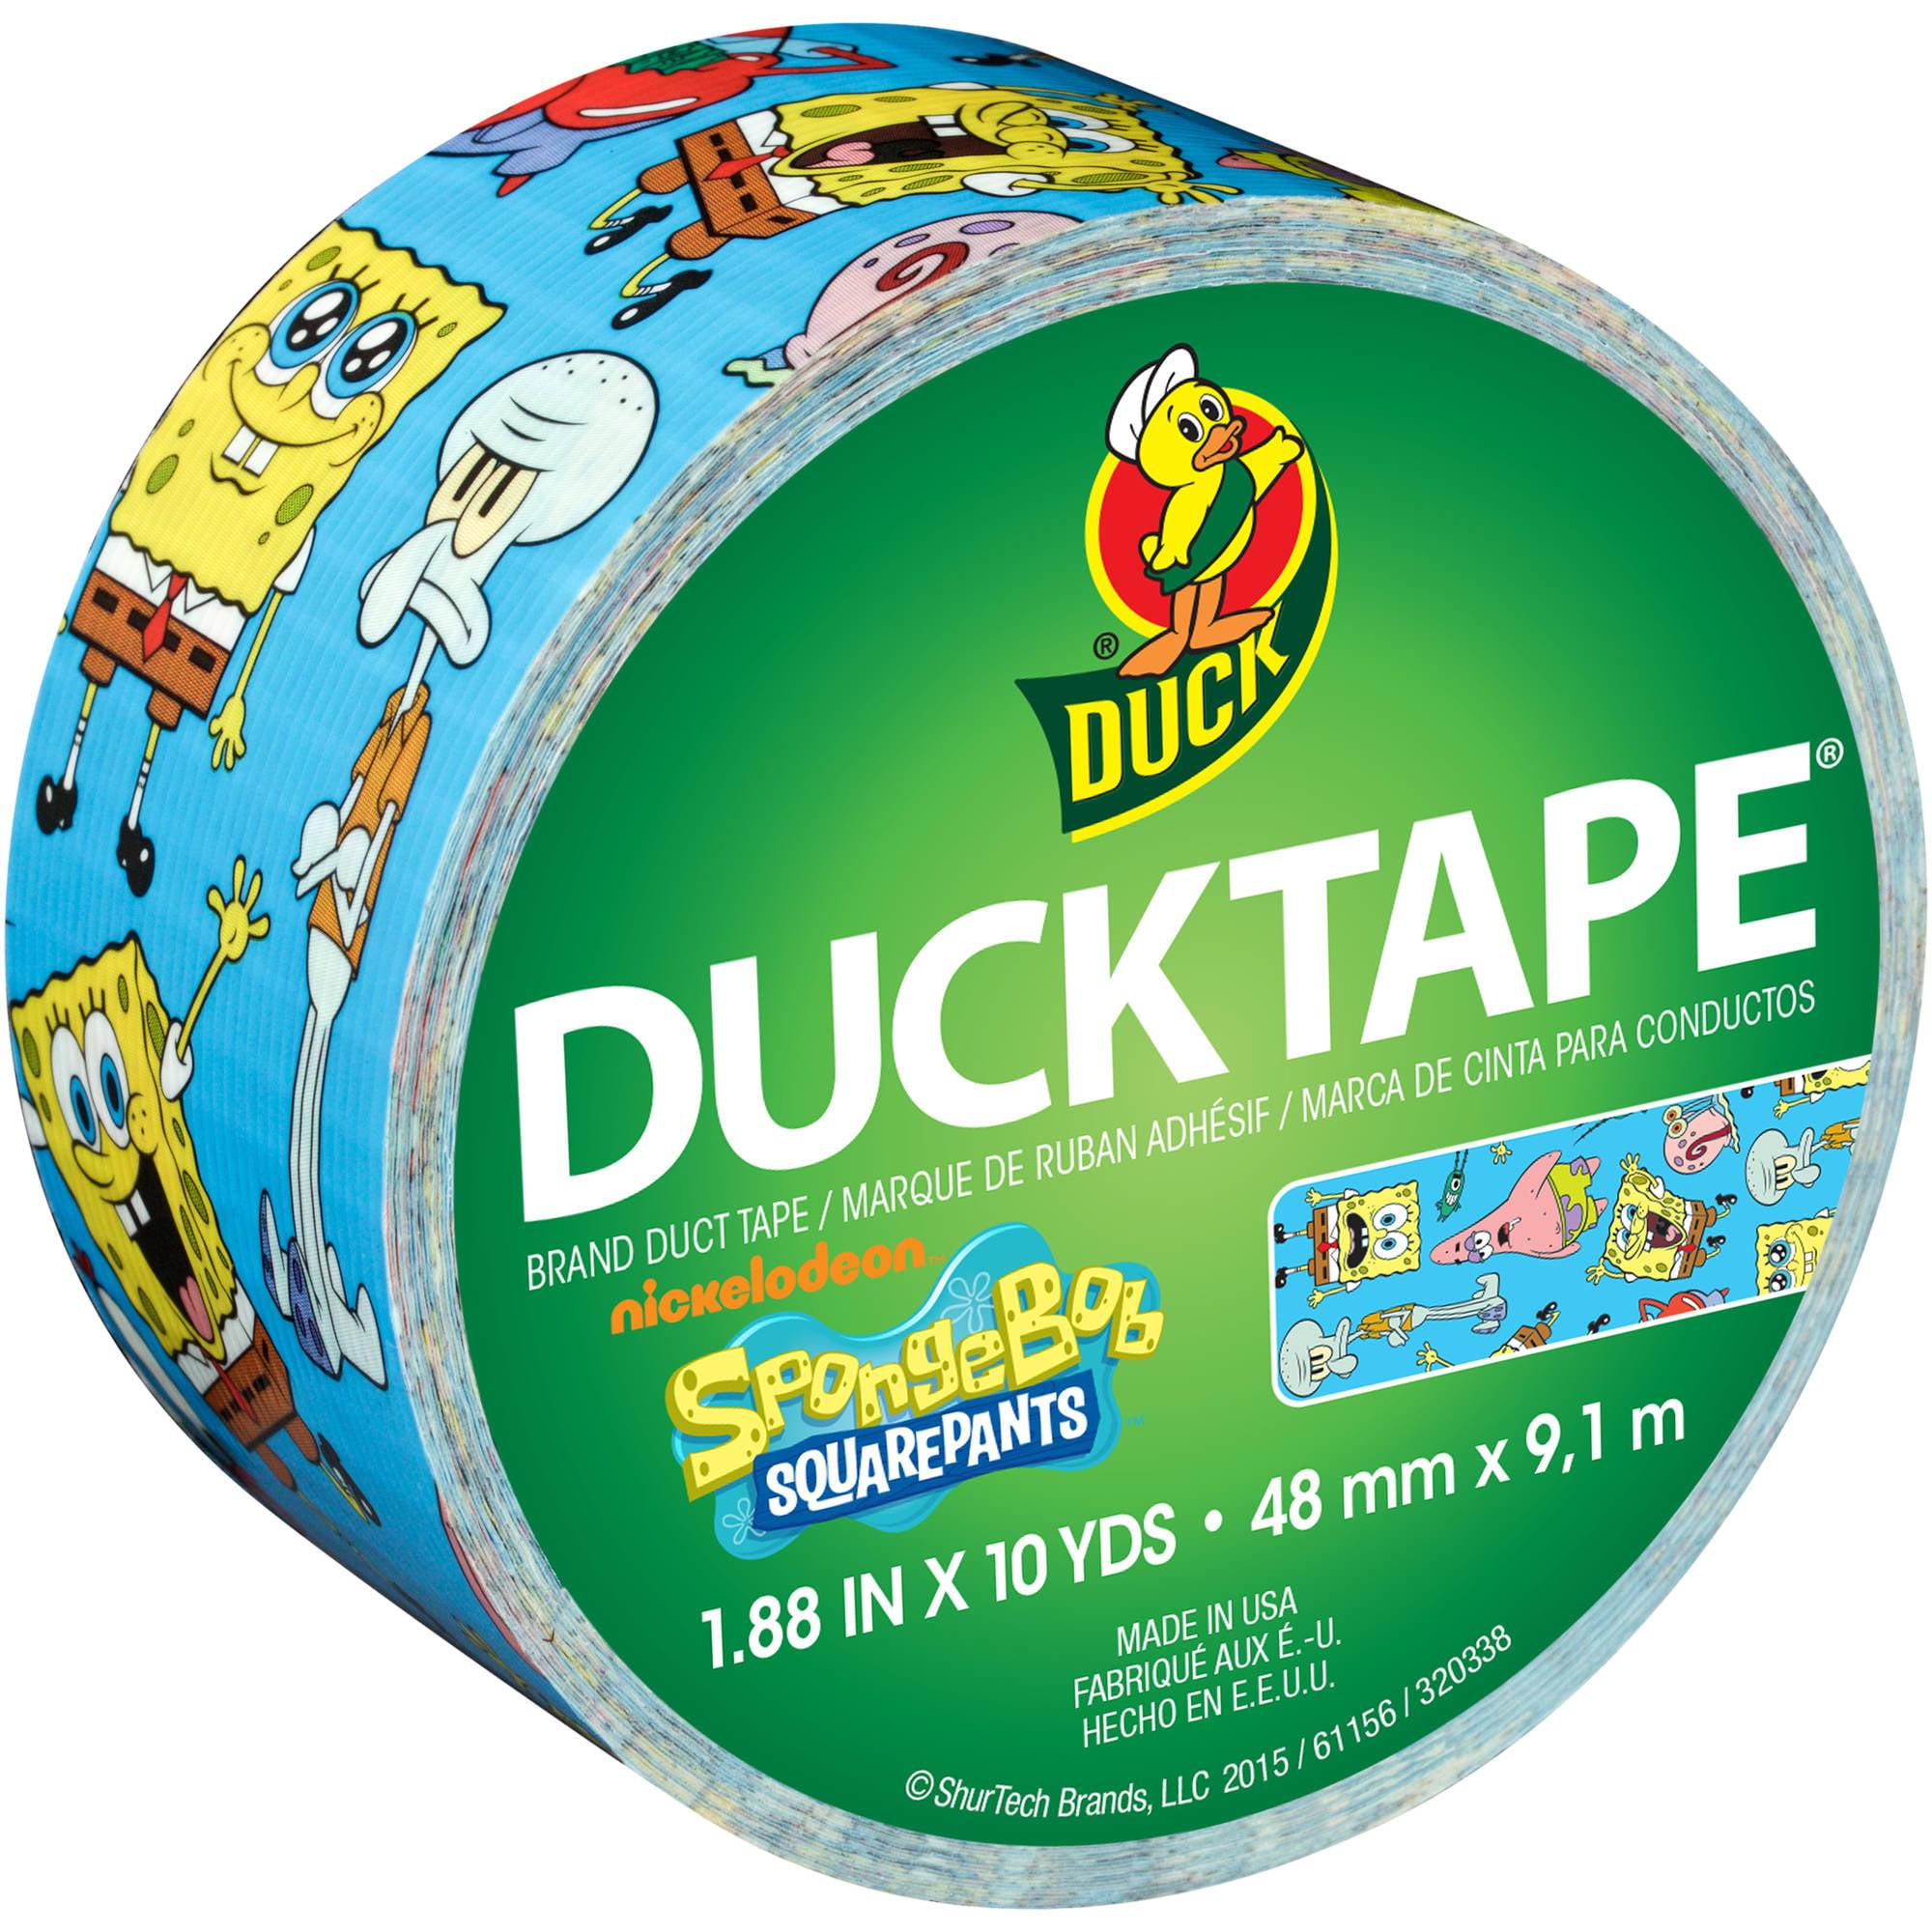 "Duck Brand Duct Tape, 1.88"" x 10 Yards, SpongeBob SquarePants Duct Tape"